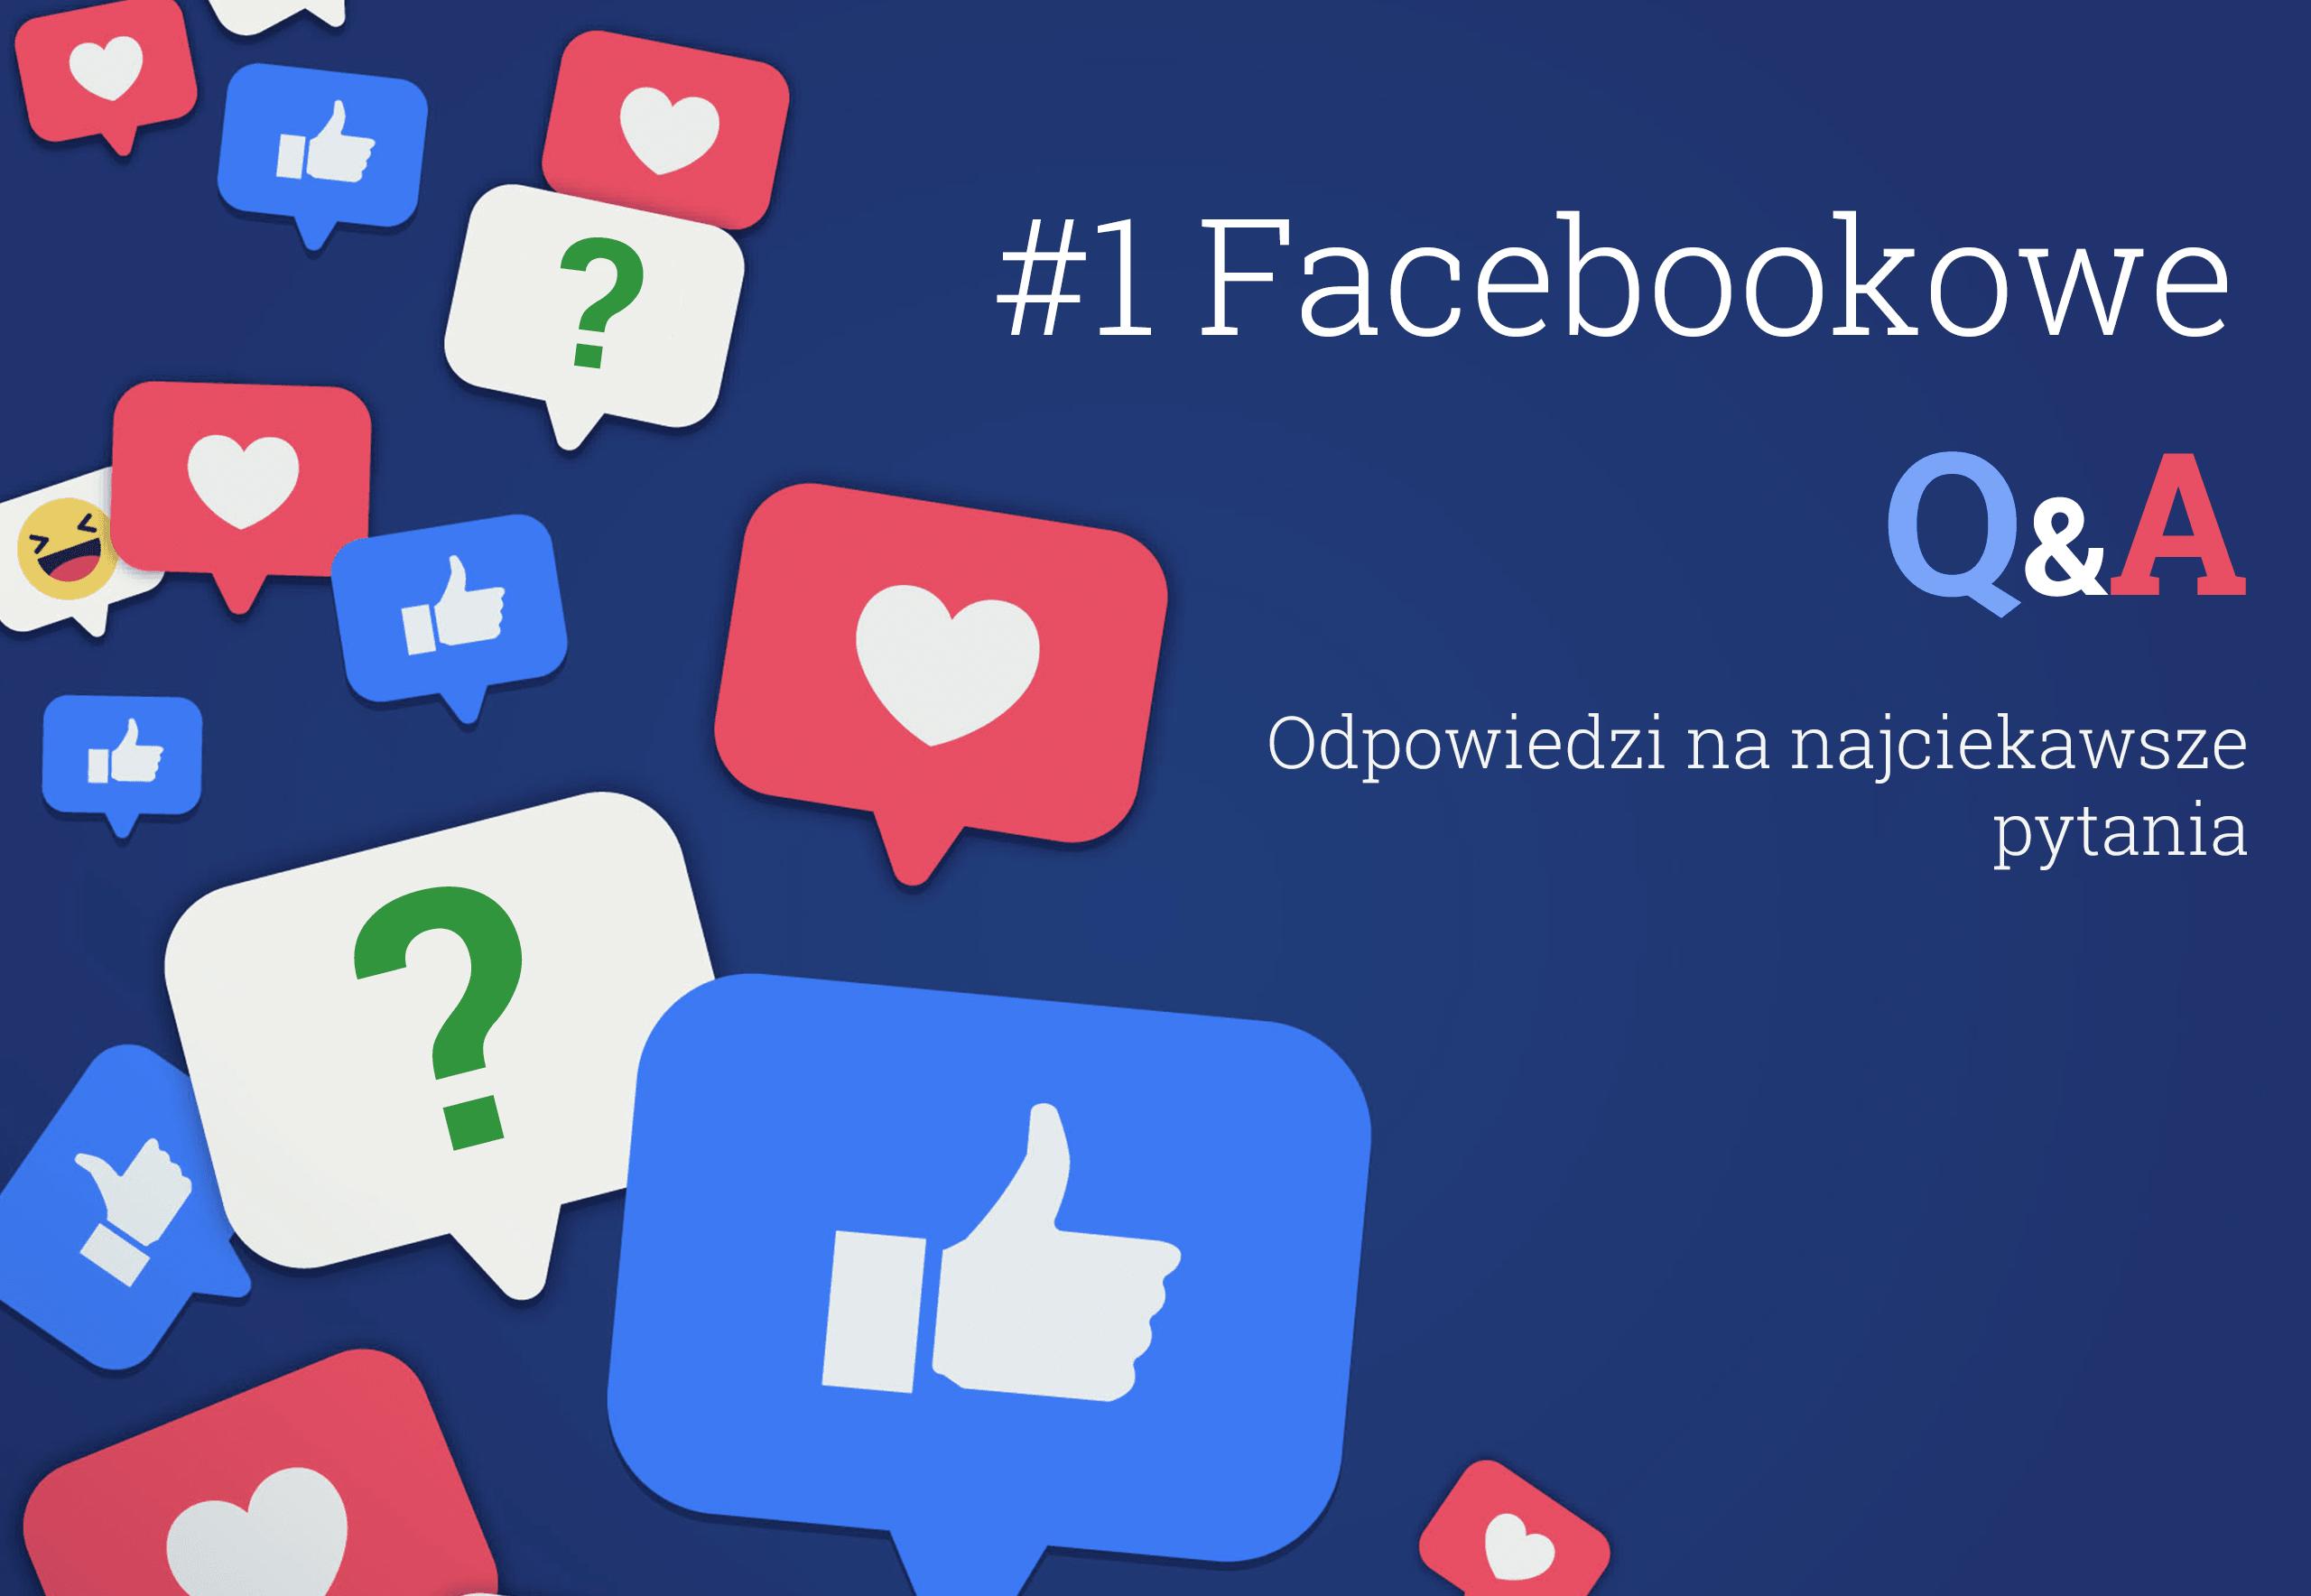 Facebookowe Q&A - Odpowiedzi na pytania Facebook